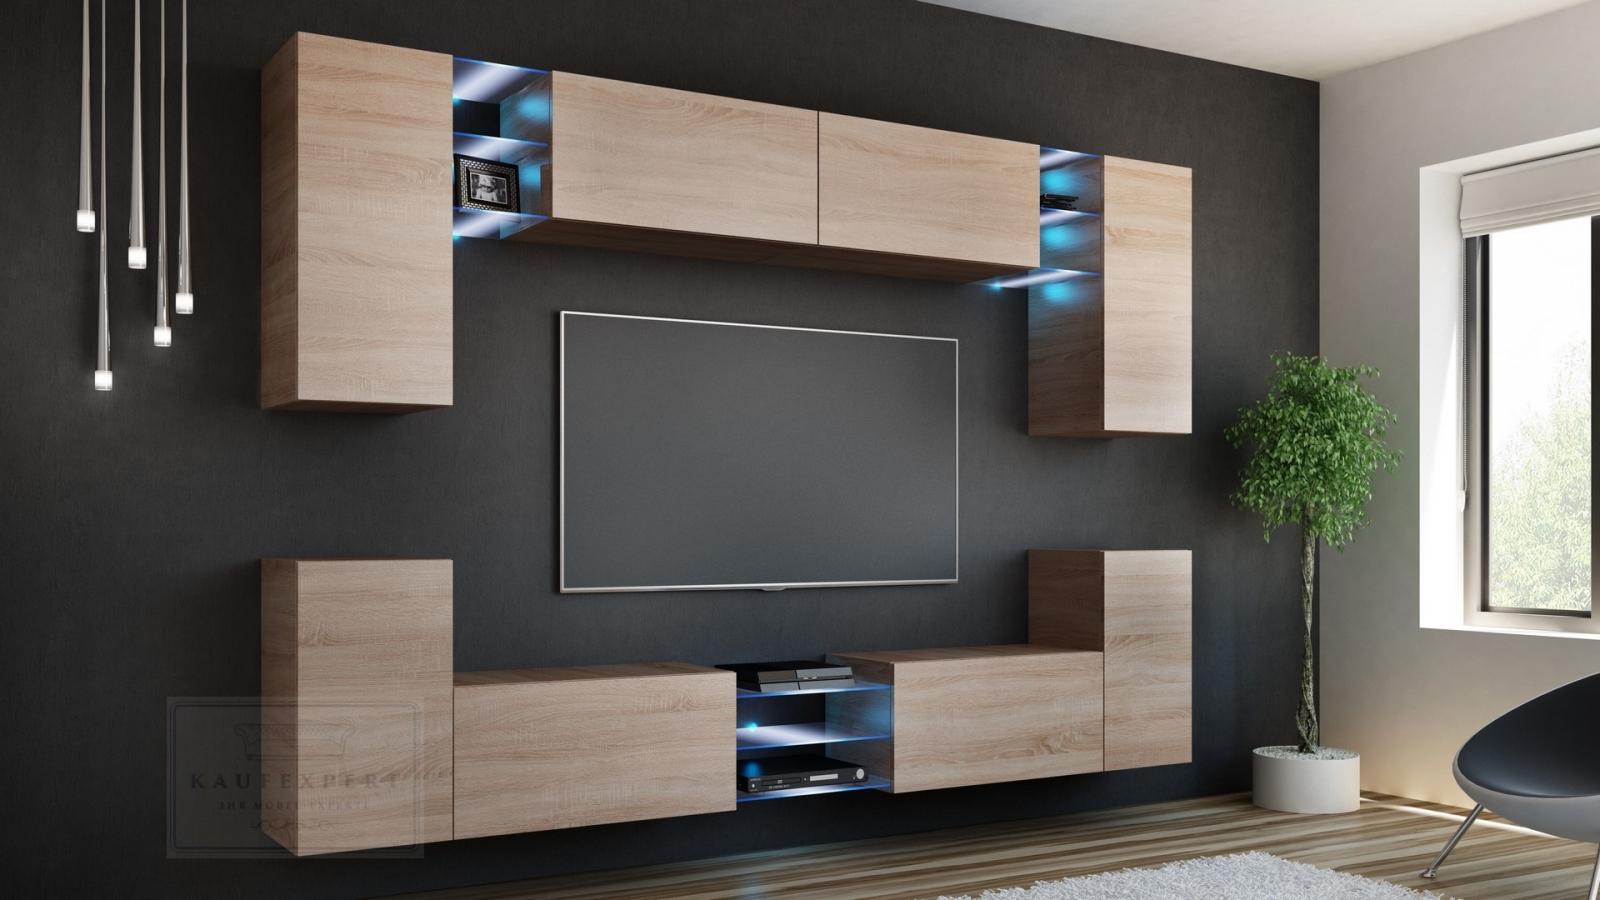 kaufexpert wohnwand galaxy sonoma eiche mediawand medienwand design modern led beleuchtung. Black Bedroom Furniture Sets. Home Design Ideas